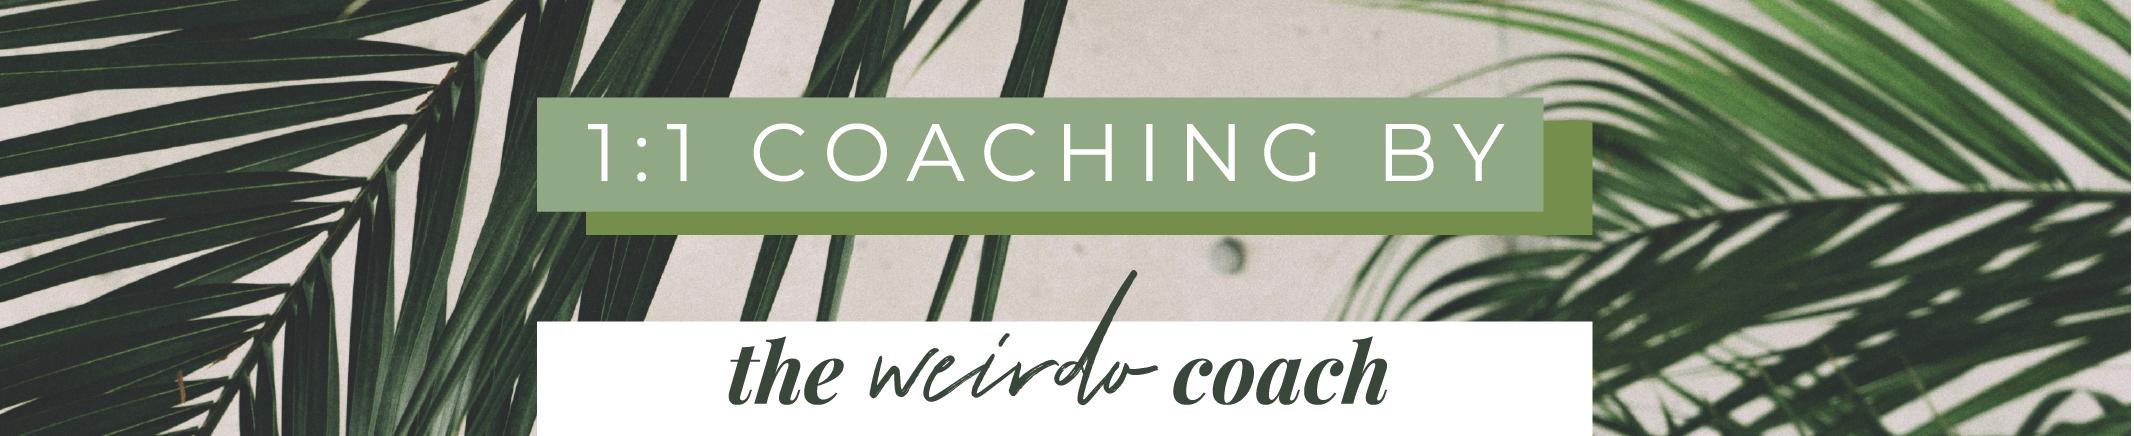 1-1 coaching banner-09.png